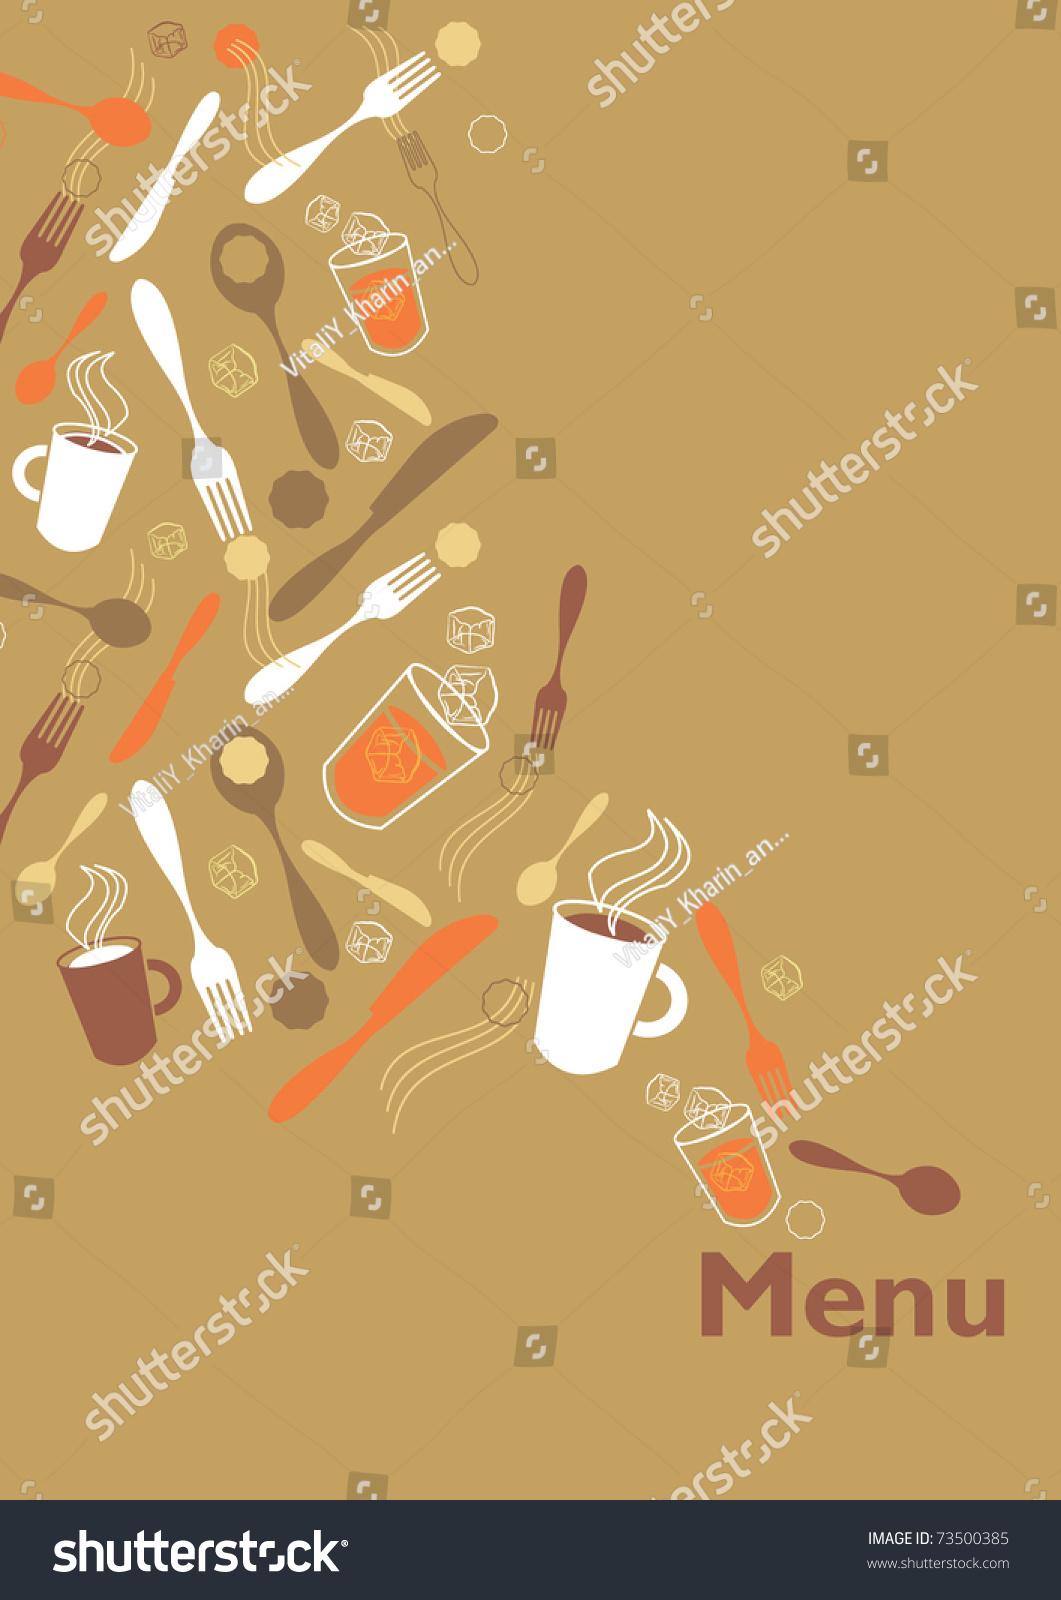 cafe breakfast menu background stock vector illustration